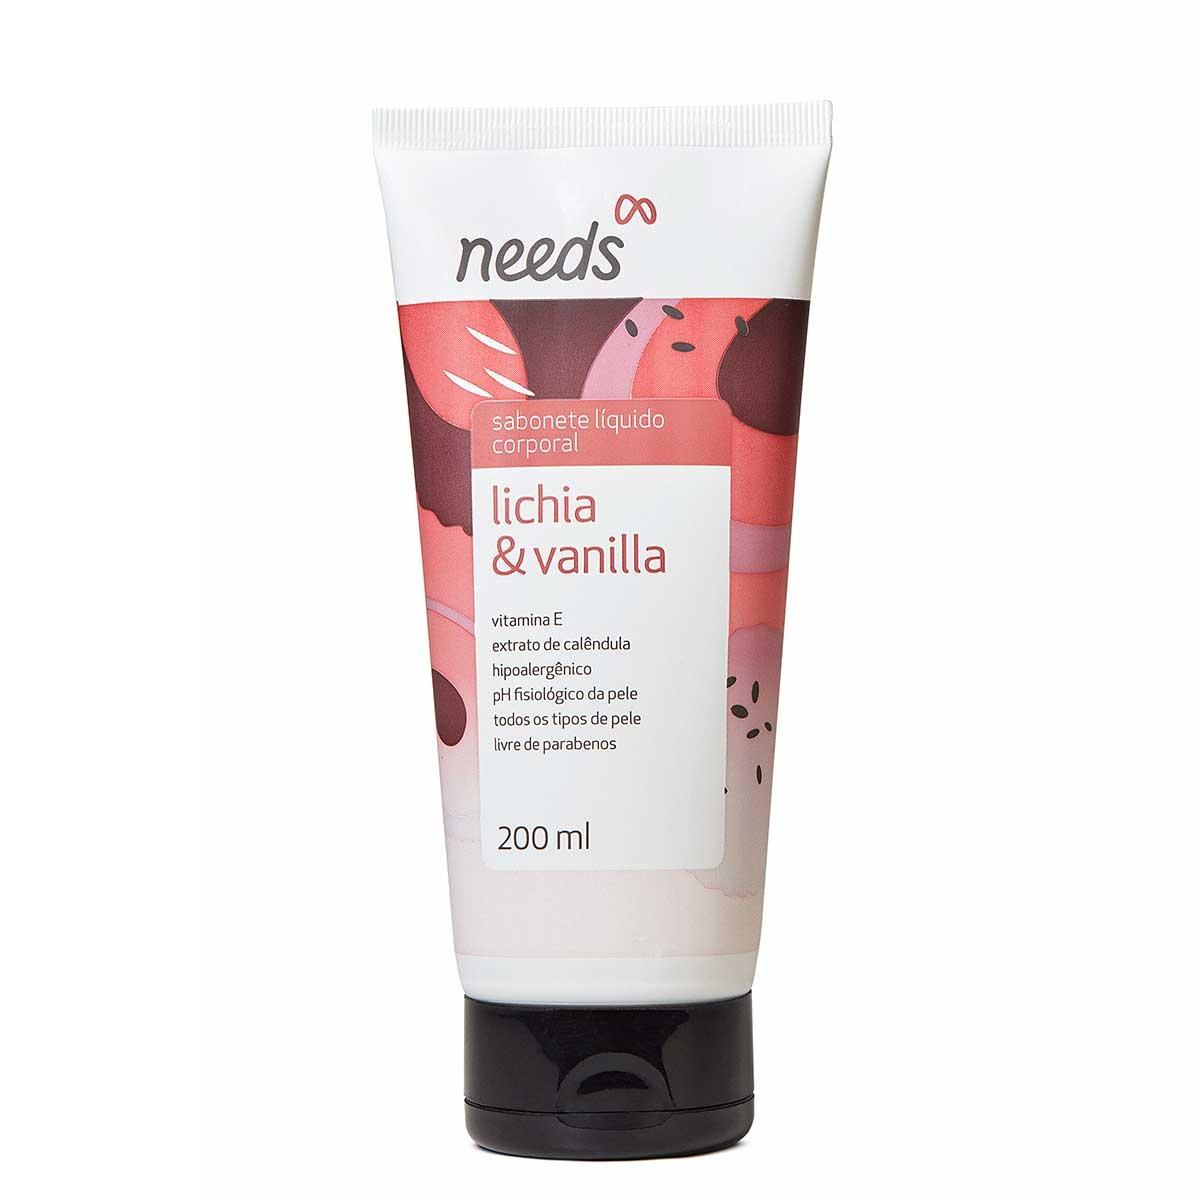 Sabonete Líquido Needs Lichia e Vanilla com 200ml 200ml